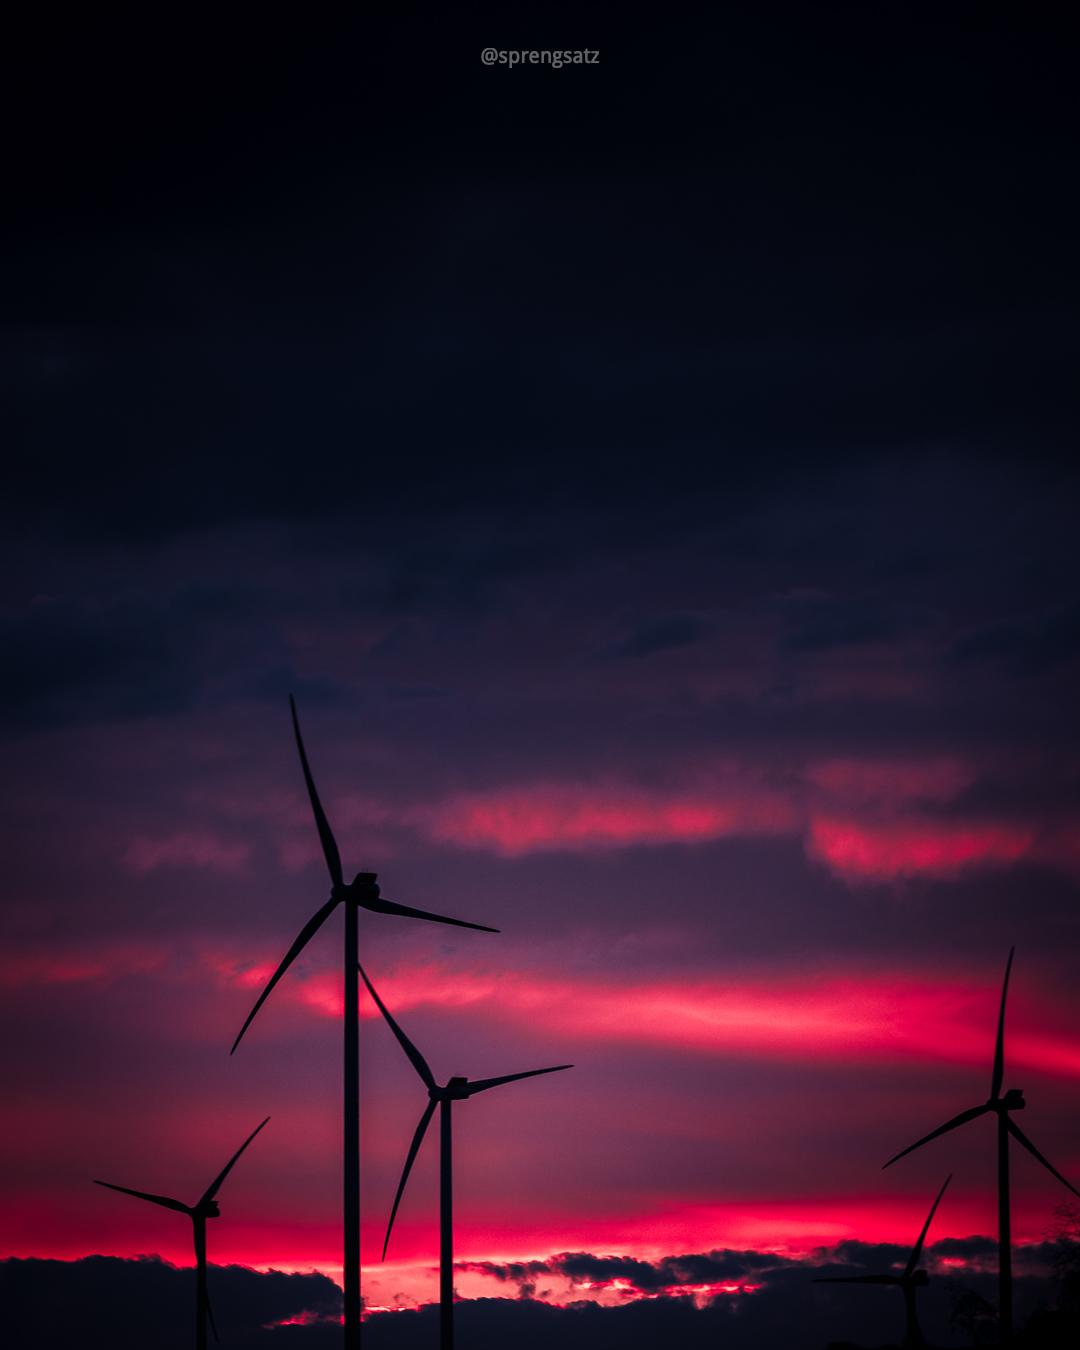 Windräder im roten Sonnenuntergang